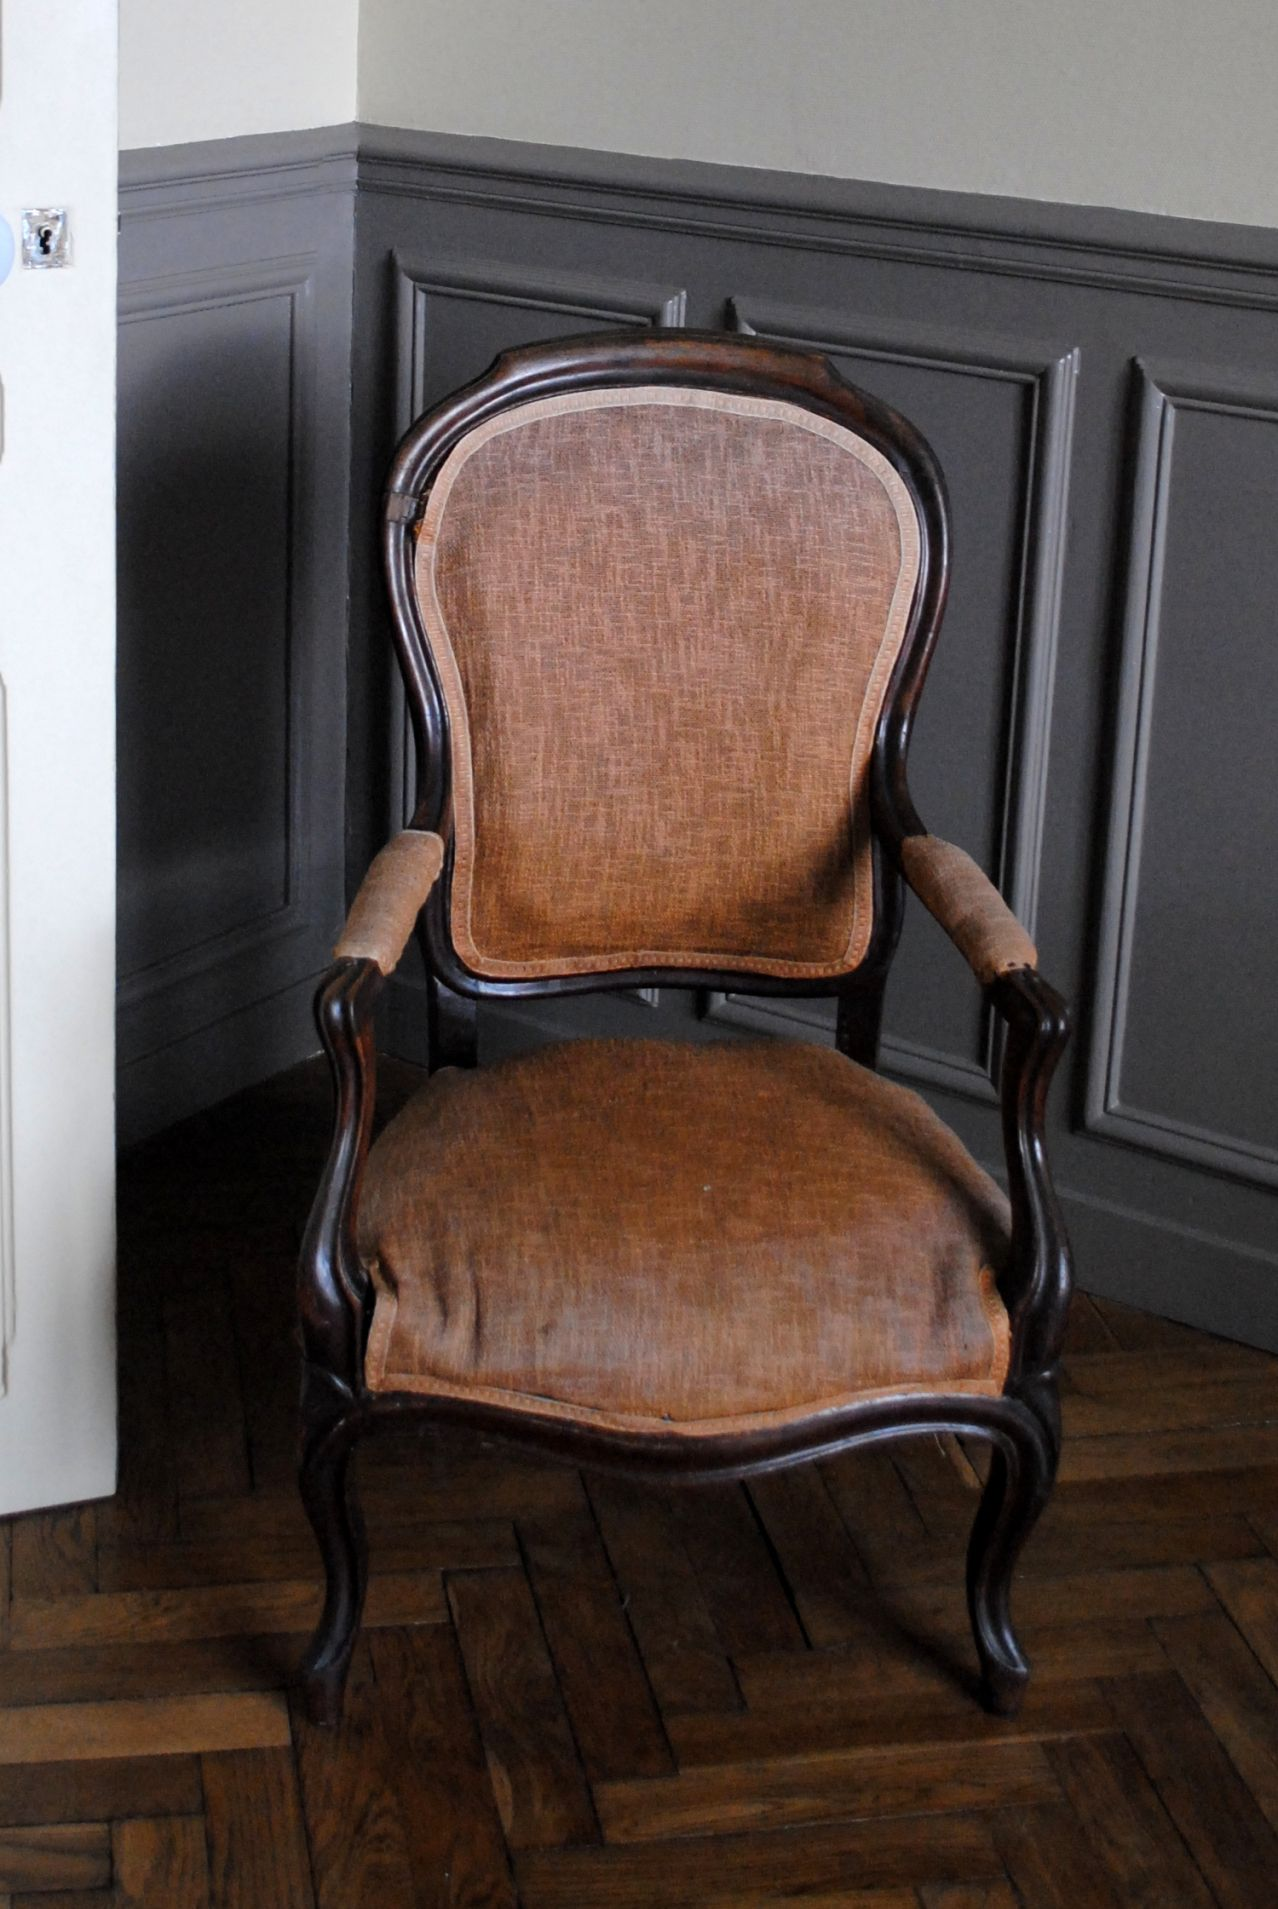 fauteuil ancien moderne. Black Bedroom Furniture Sets. Home Design Ideas